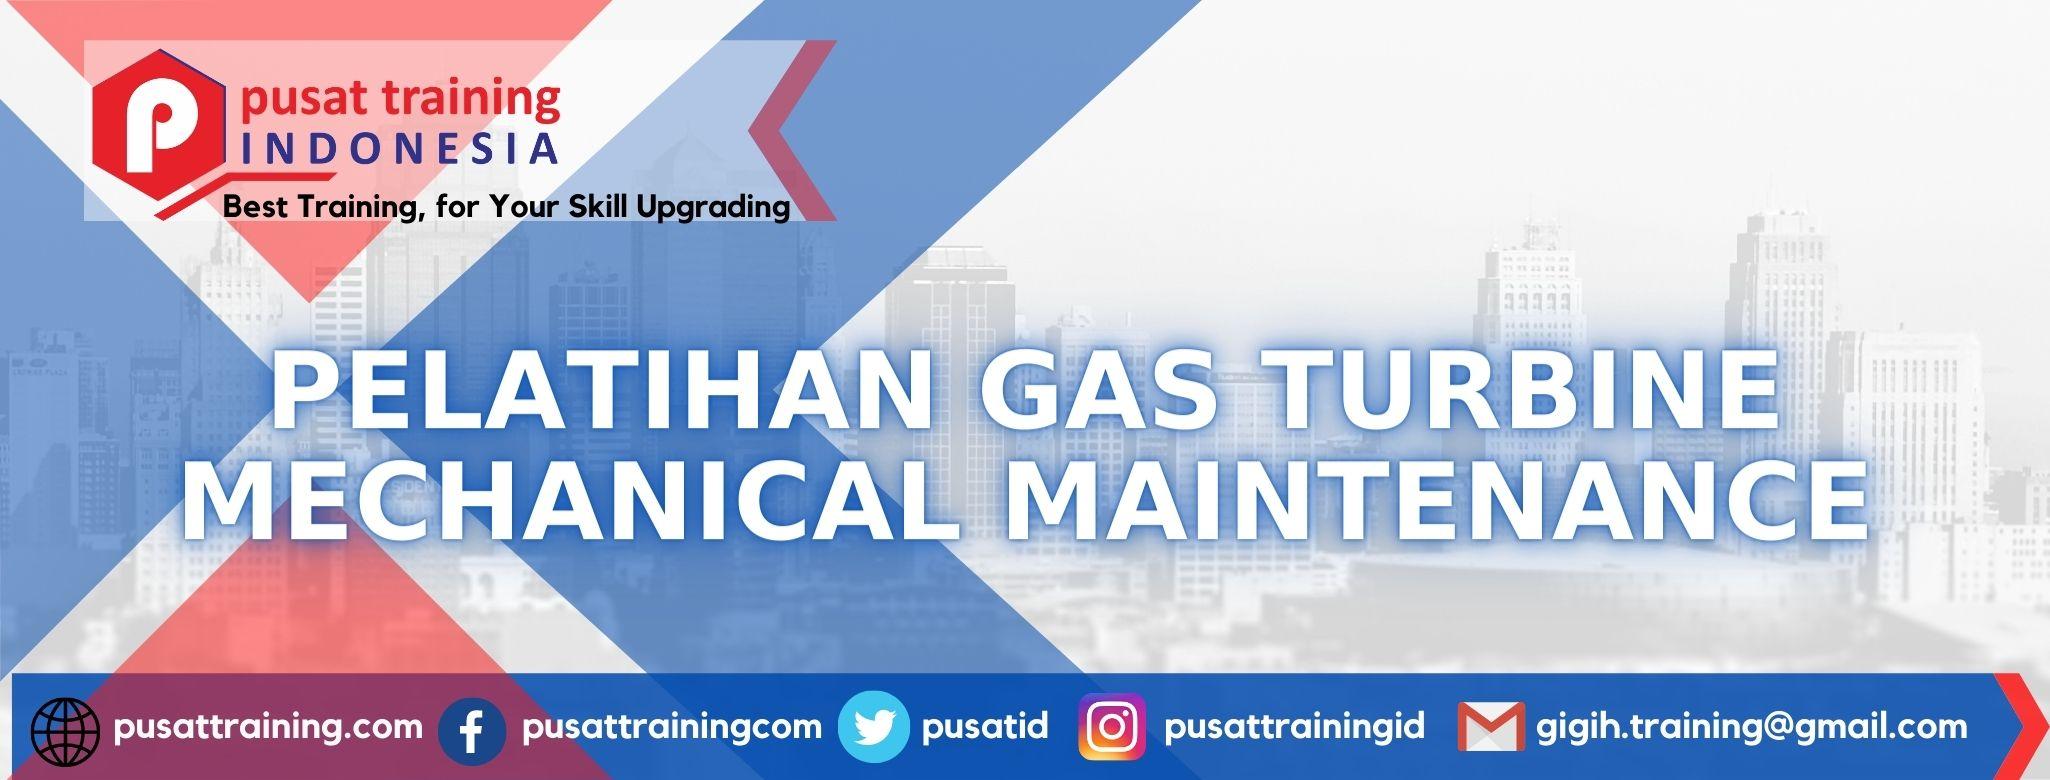 pelatihan-gas-turbine-mechanical-maintenance